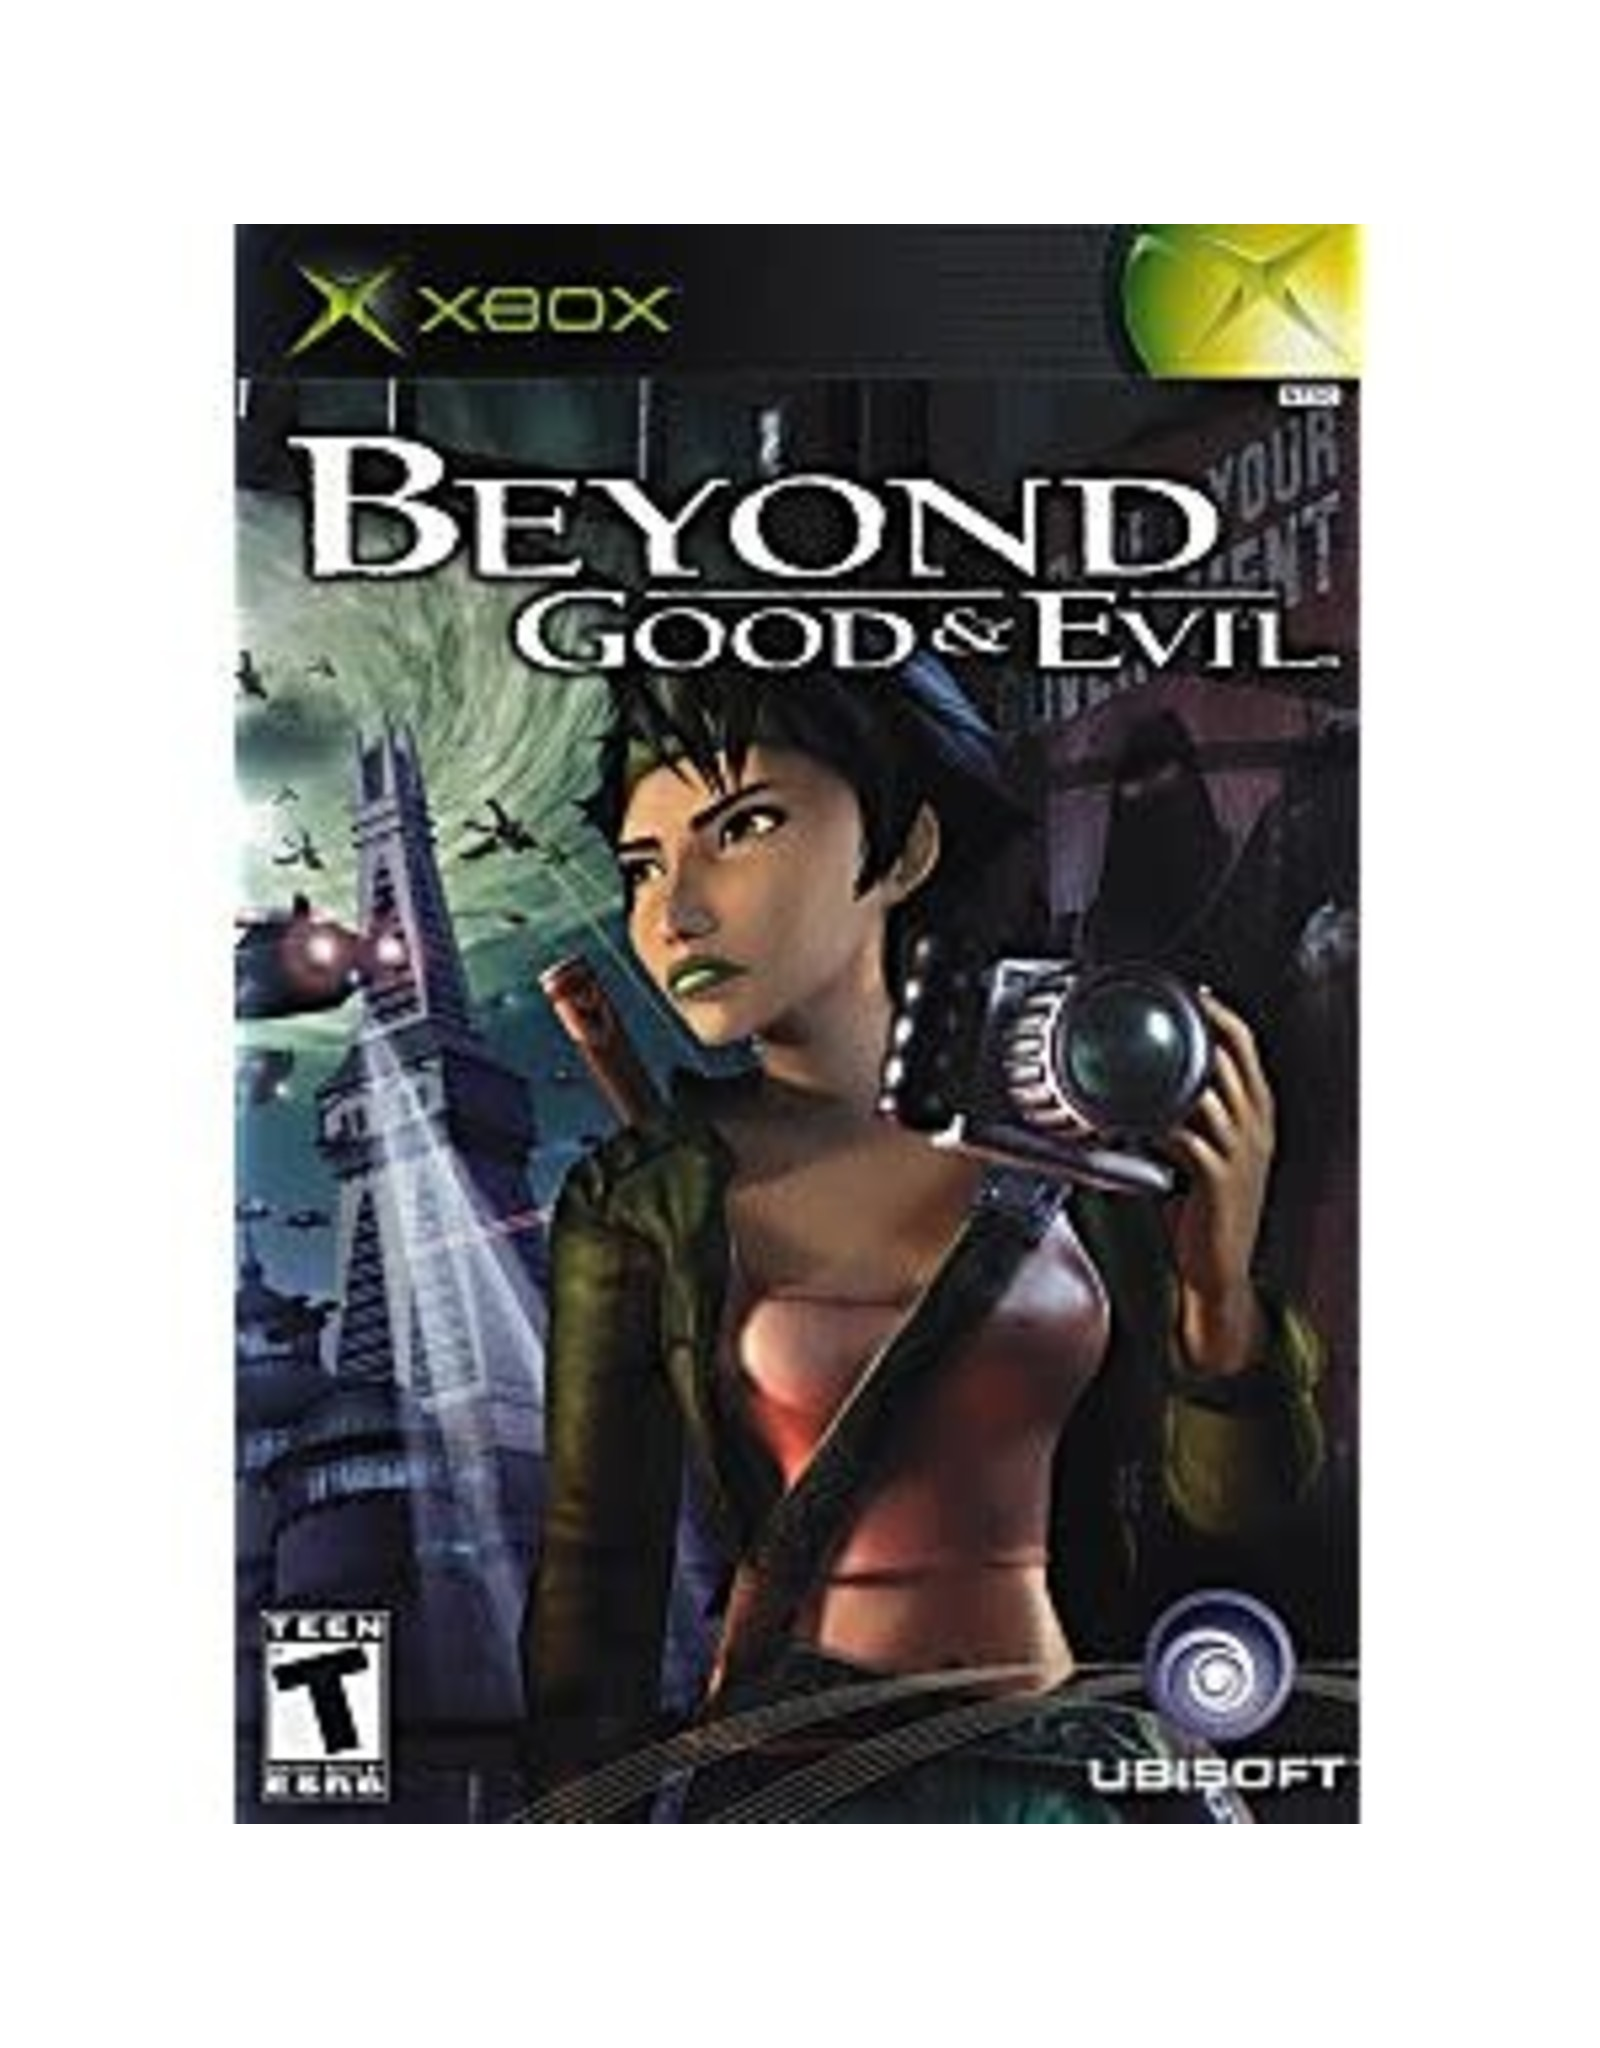 Xbox Beyond Good and Evil (CiB)